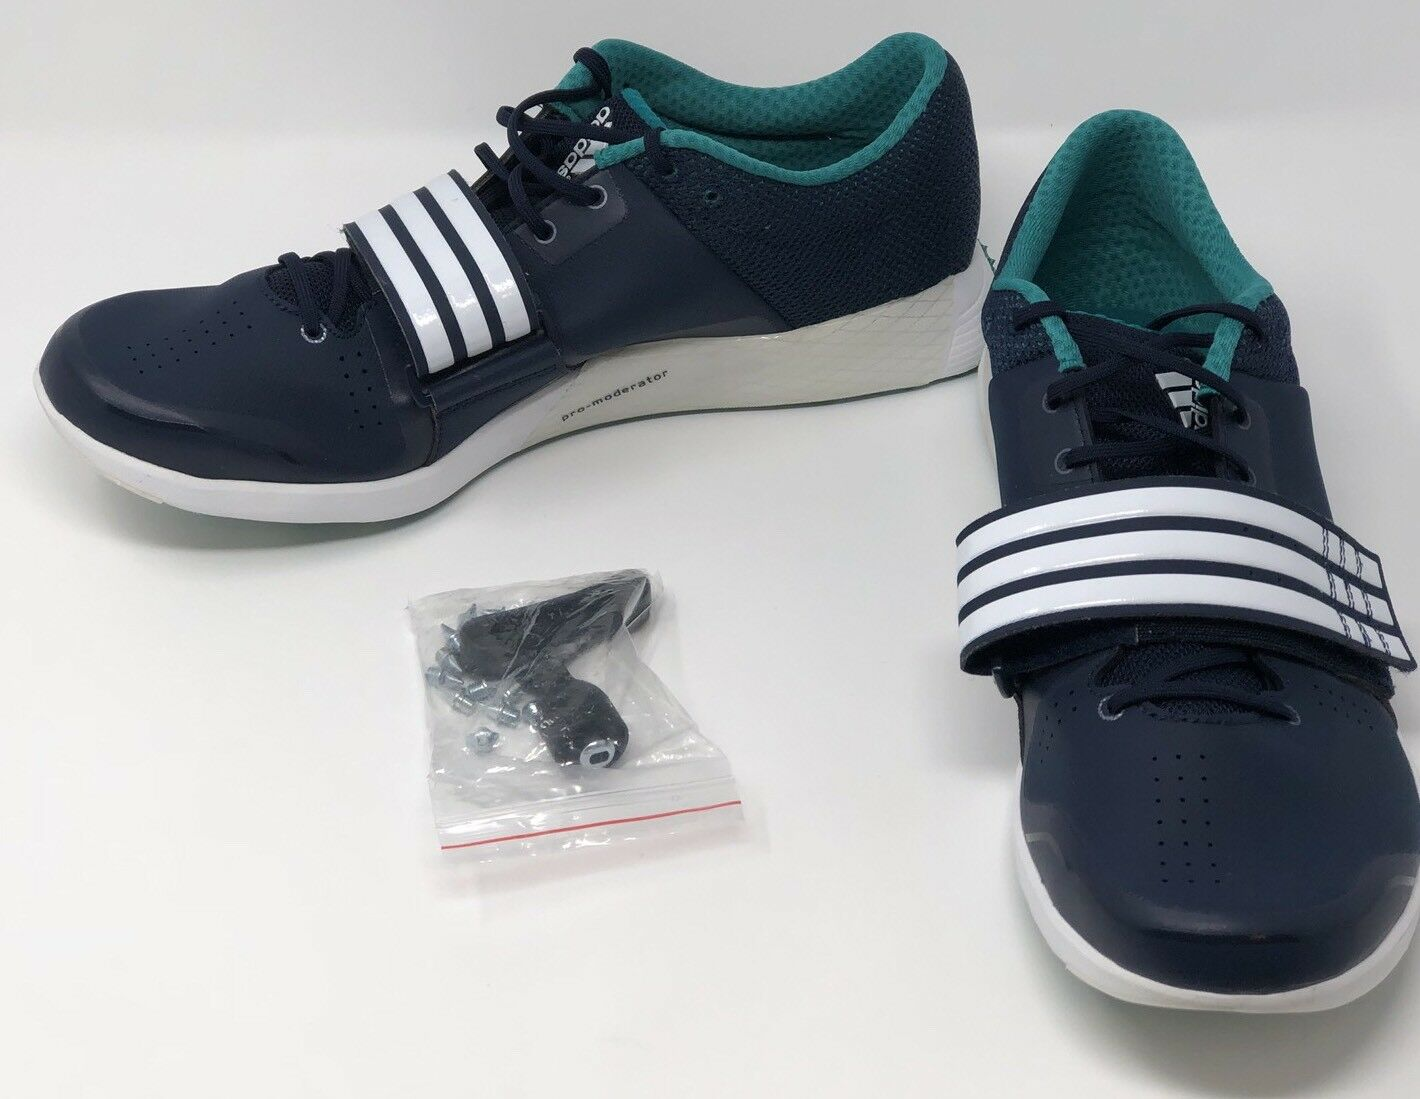 Adidas Performance Adizero TJ/PV Triple Jump Pole Vault Shoe Navy Sz 12 AF5664 Seasonal price cuts, discount benefits